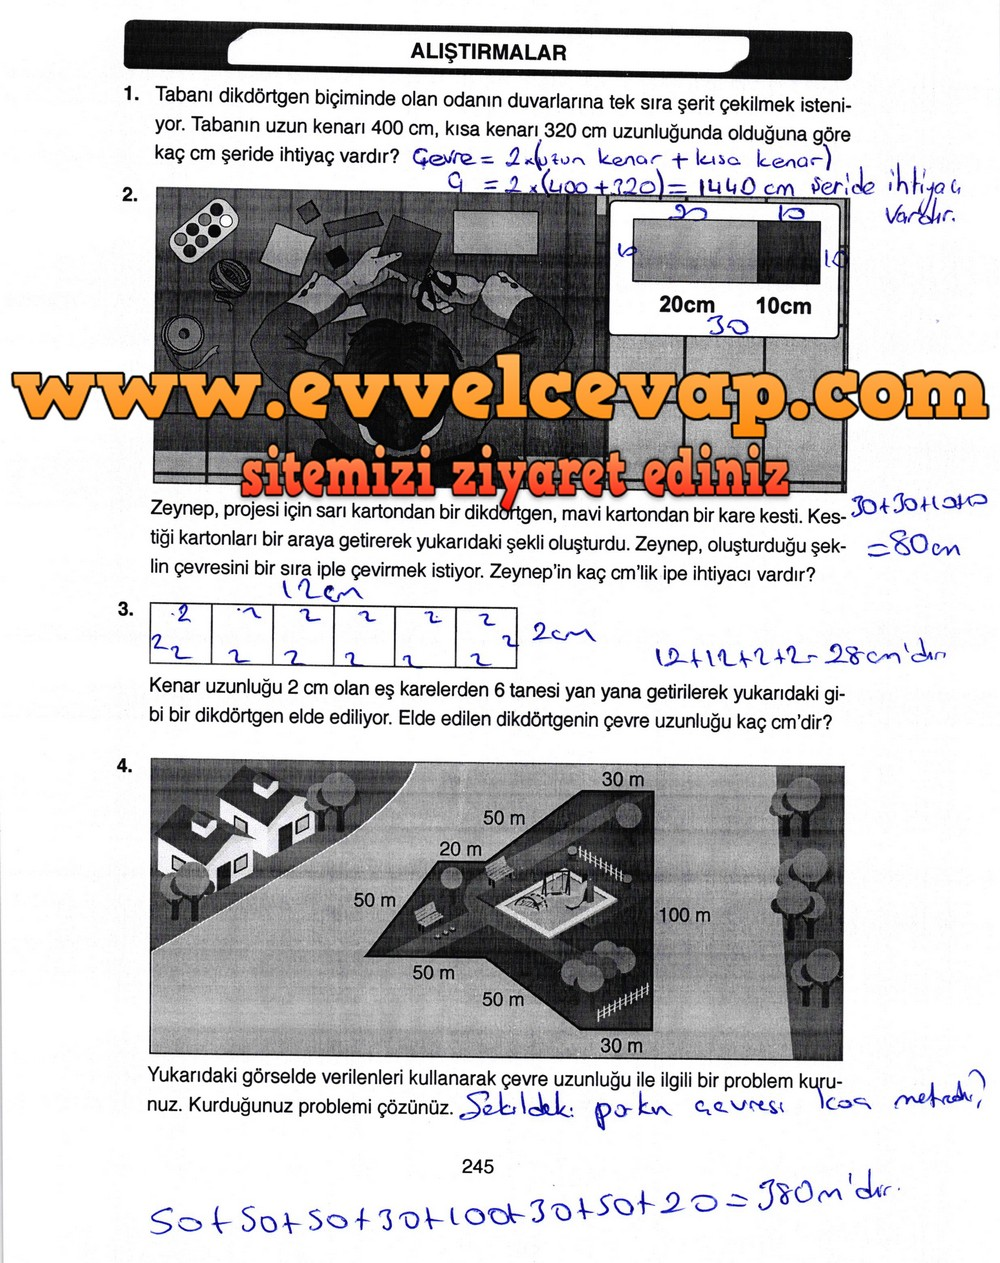 4 Sinif Matematik Ata Yayinlari Ders Kitabi Cevaplari Sayfa 245